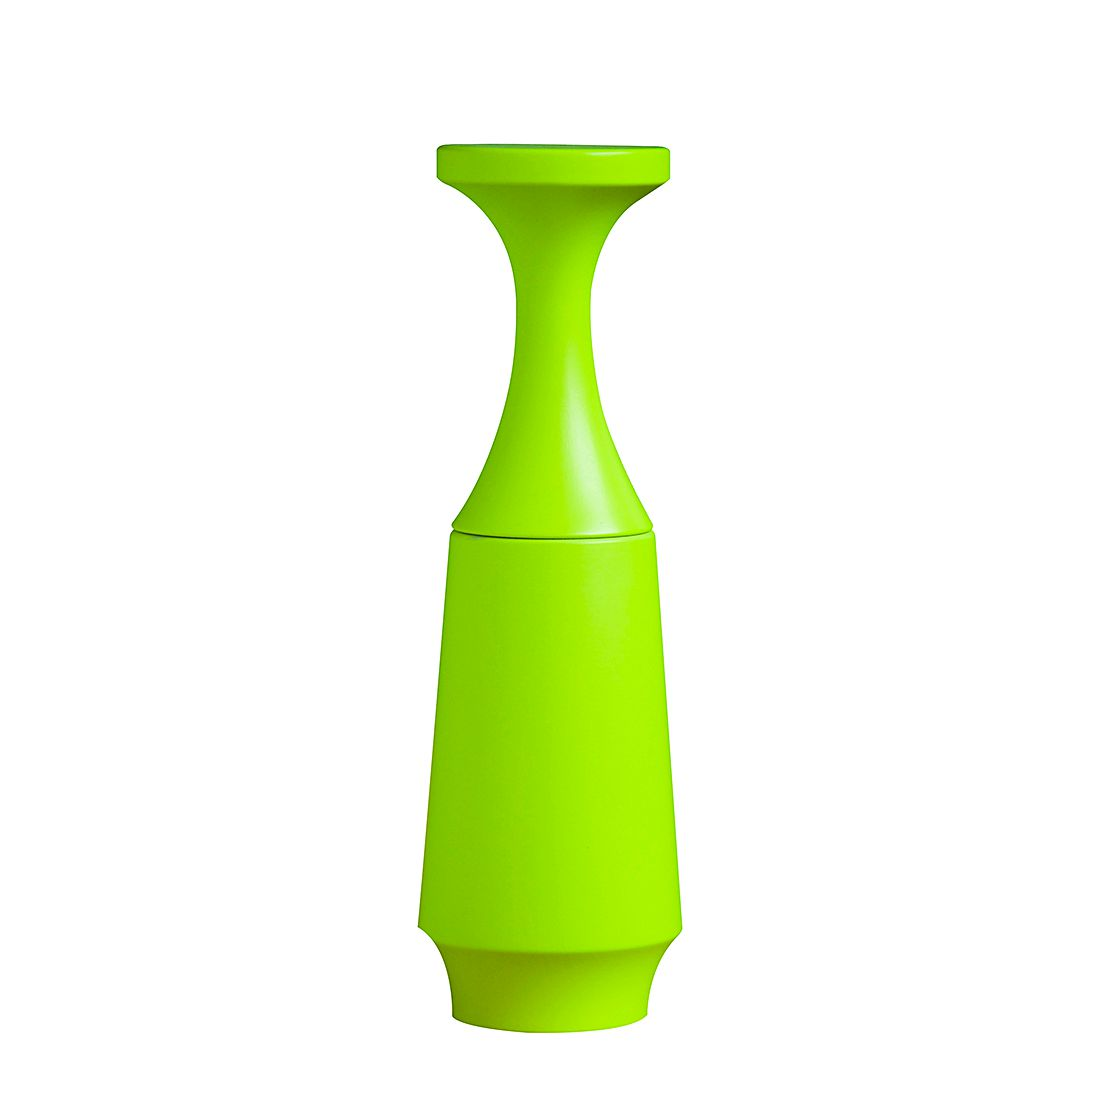 Salz-/Pfeffermühle Kiki II – Buche massiv – Lime, Wireworks online kaufen